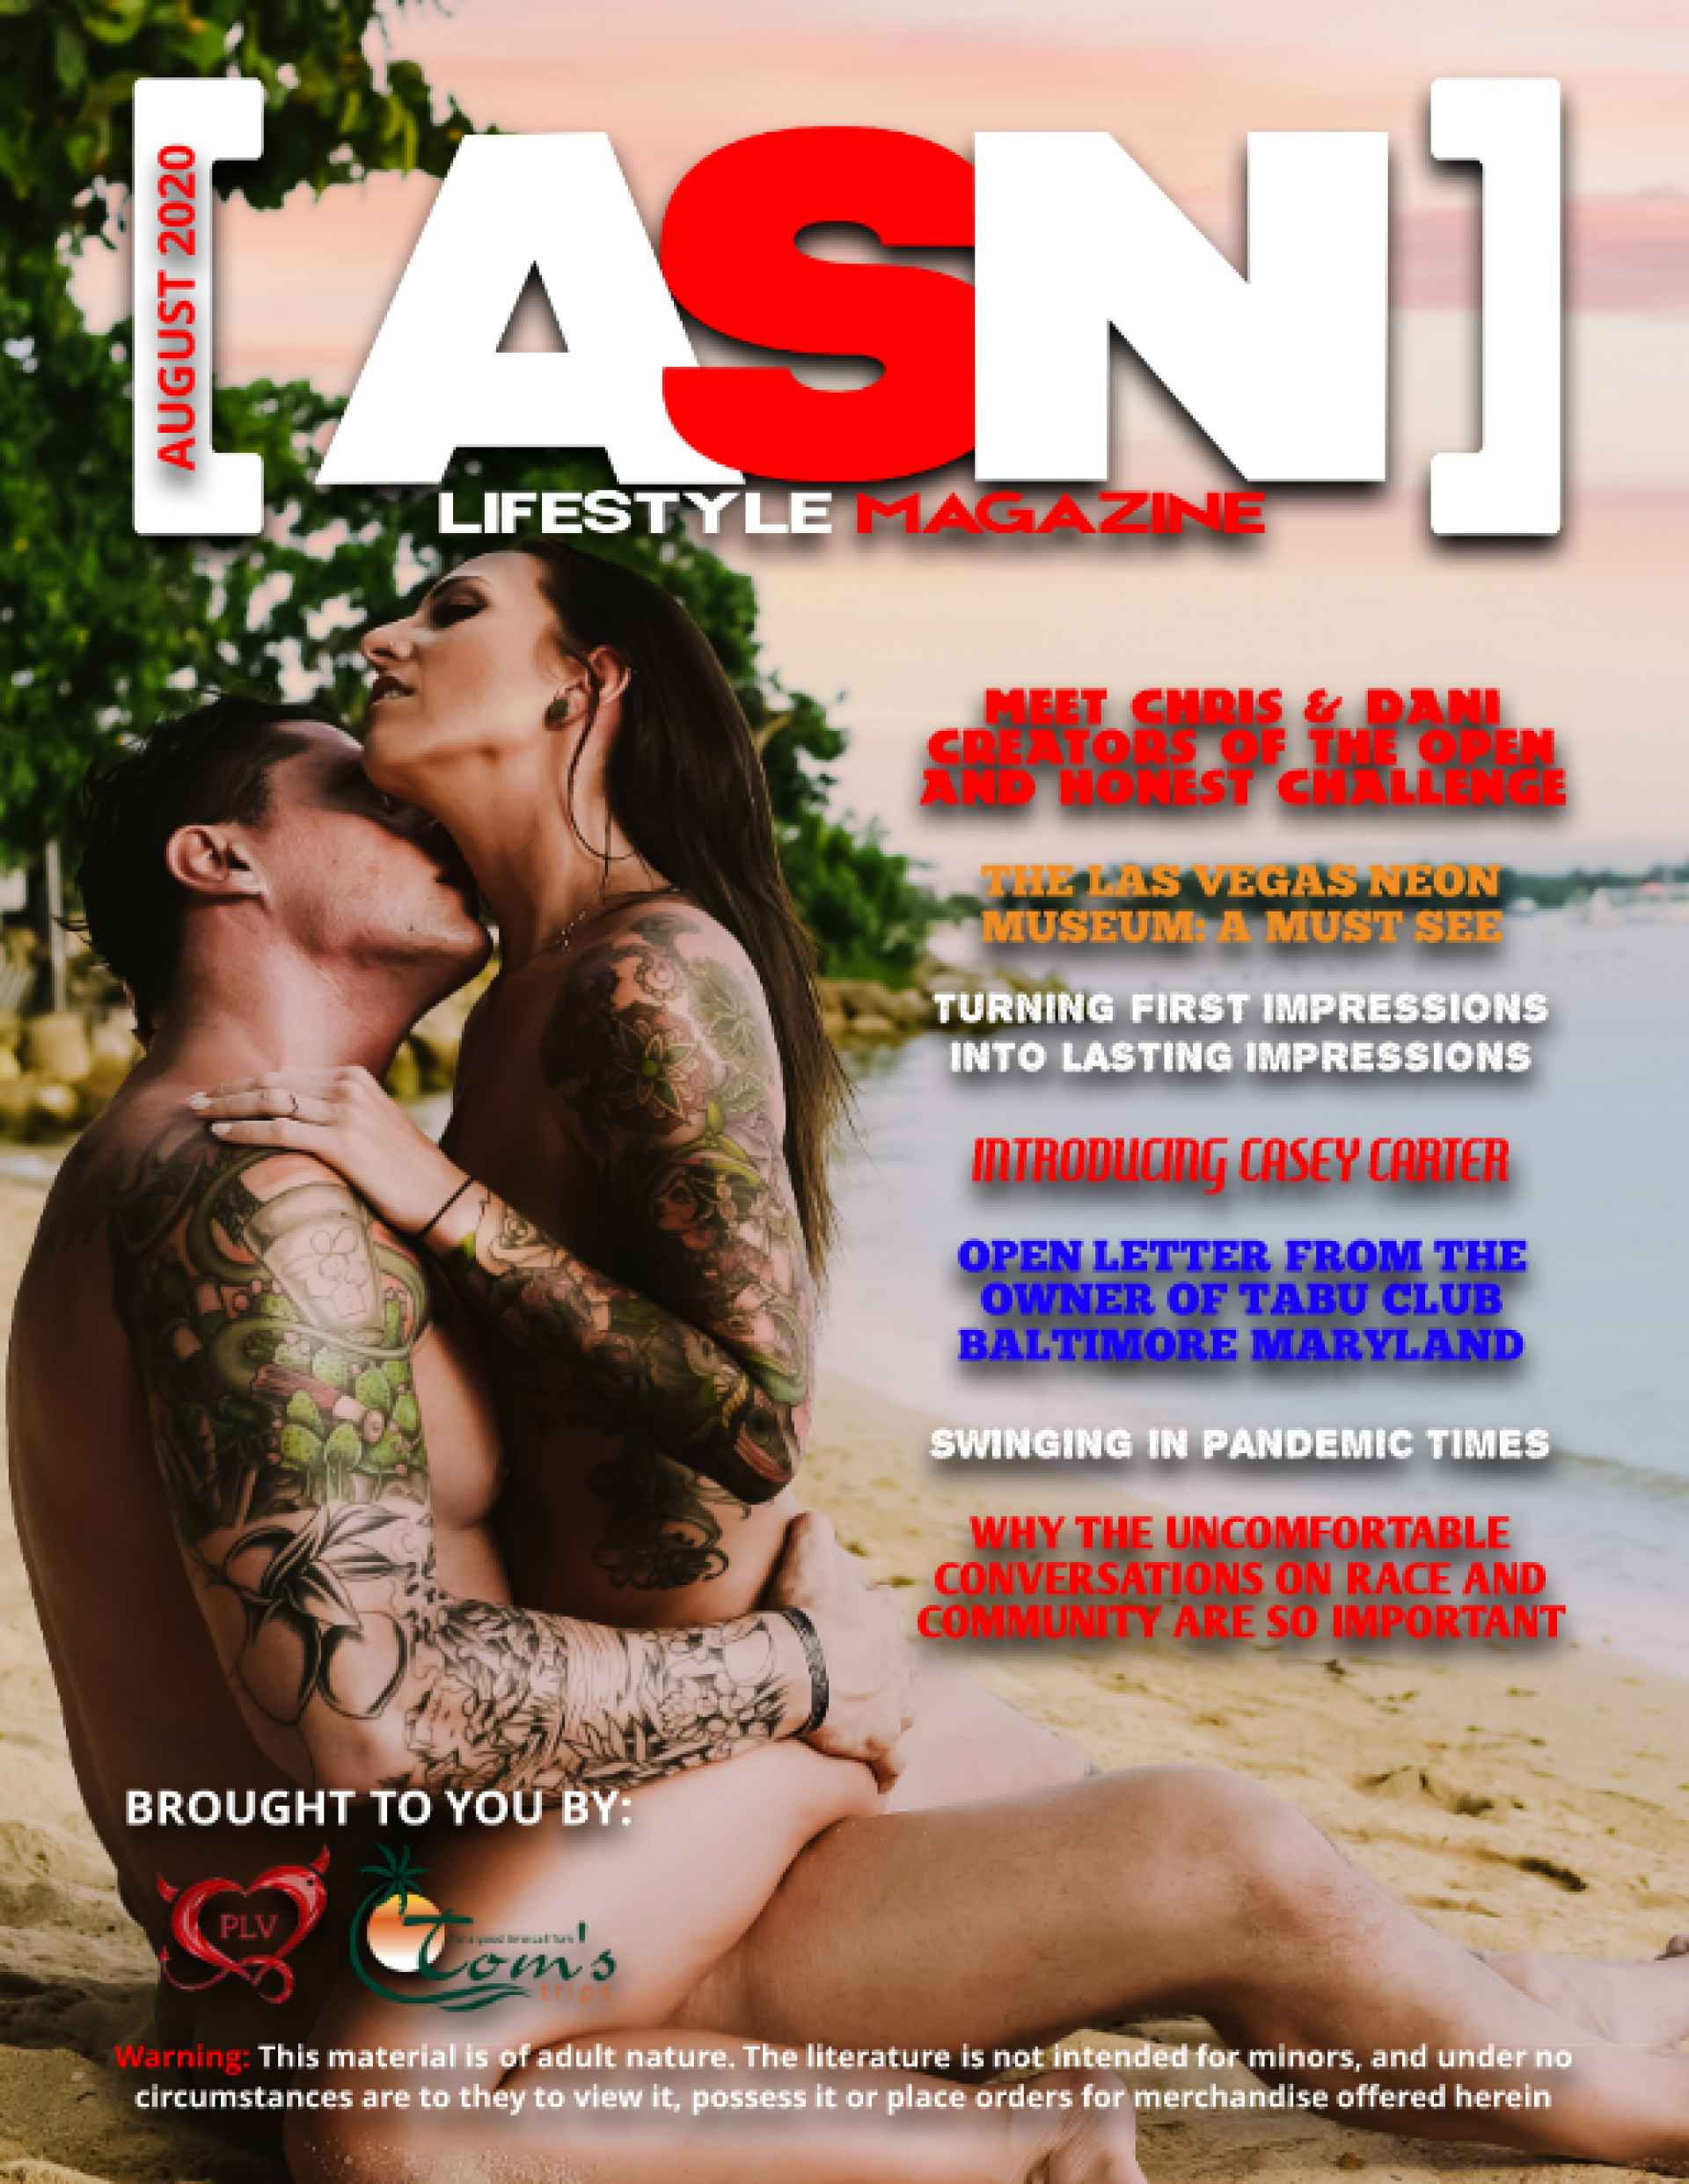 ASN Lifestyle Magazine August 2020 Cover Swingers NonMonogamy Open Honest Challenge